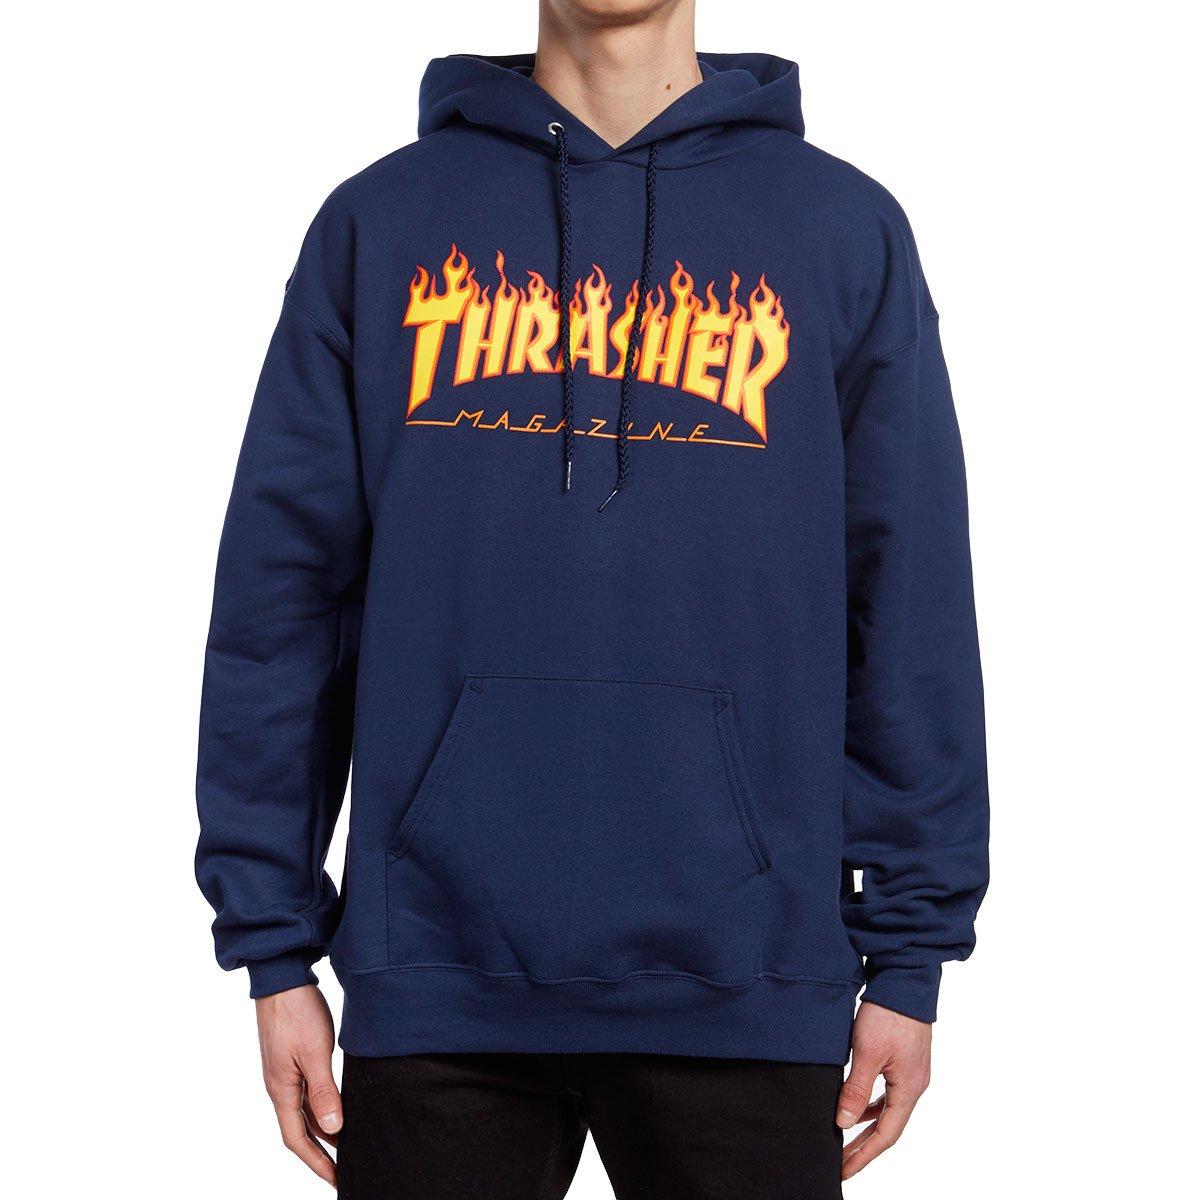 Thrasher Flame 8254 Shirts